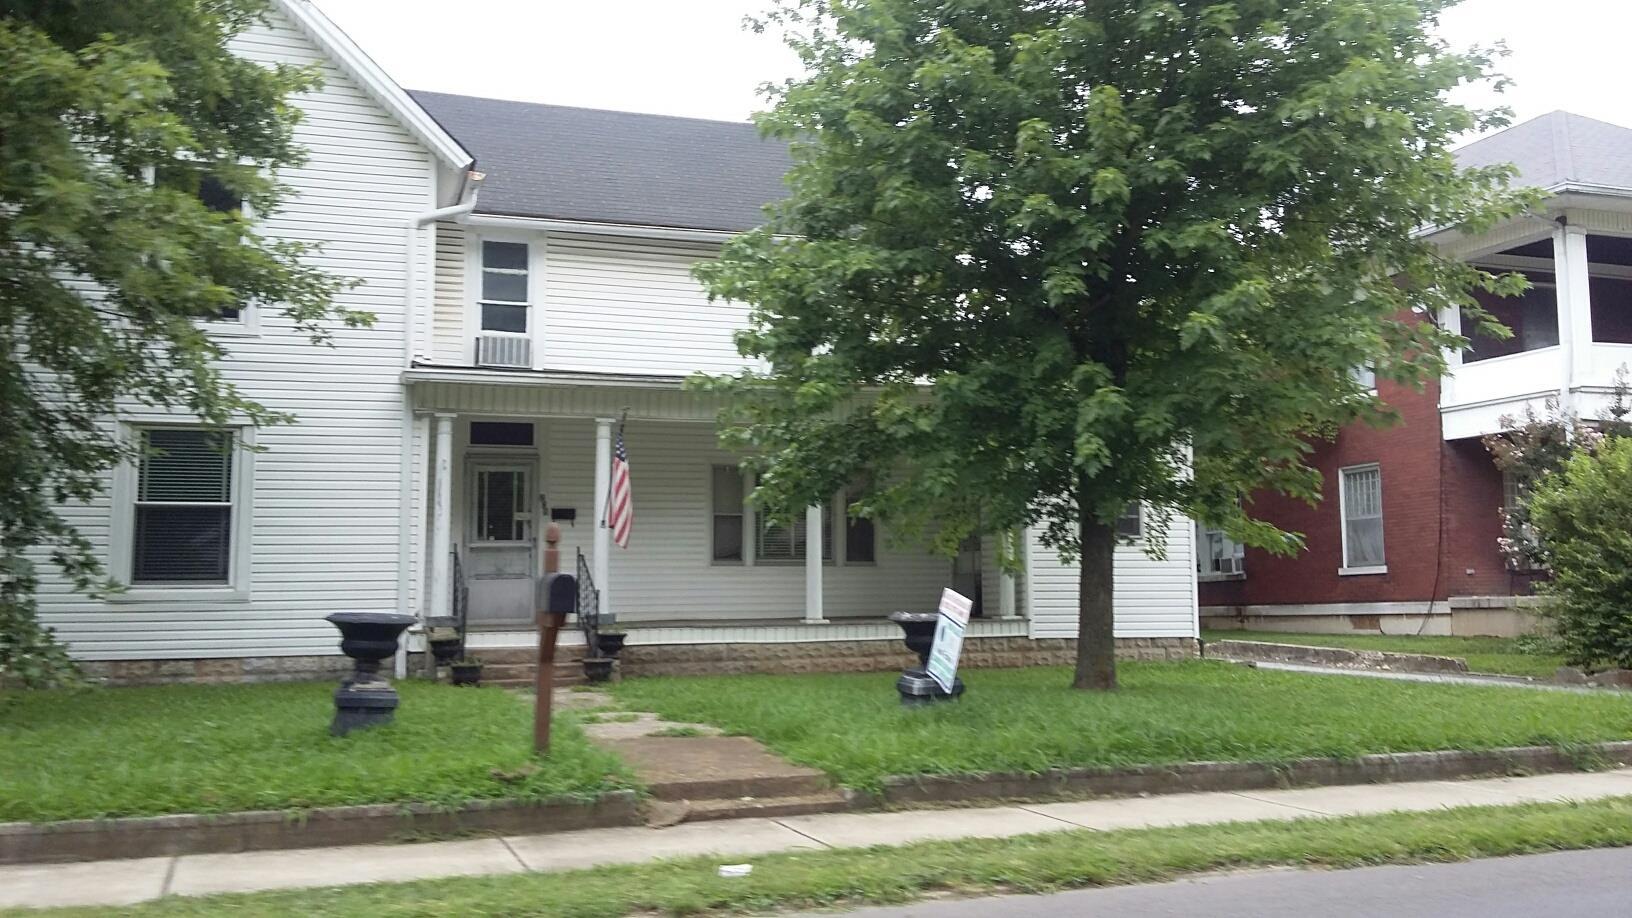 208 S Main St, Mount Pleasant, TN 38474